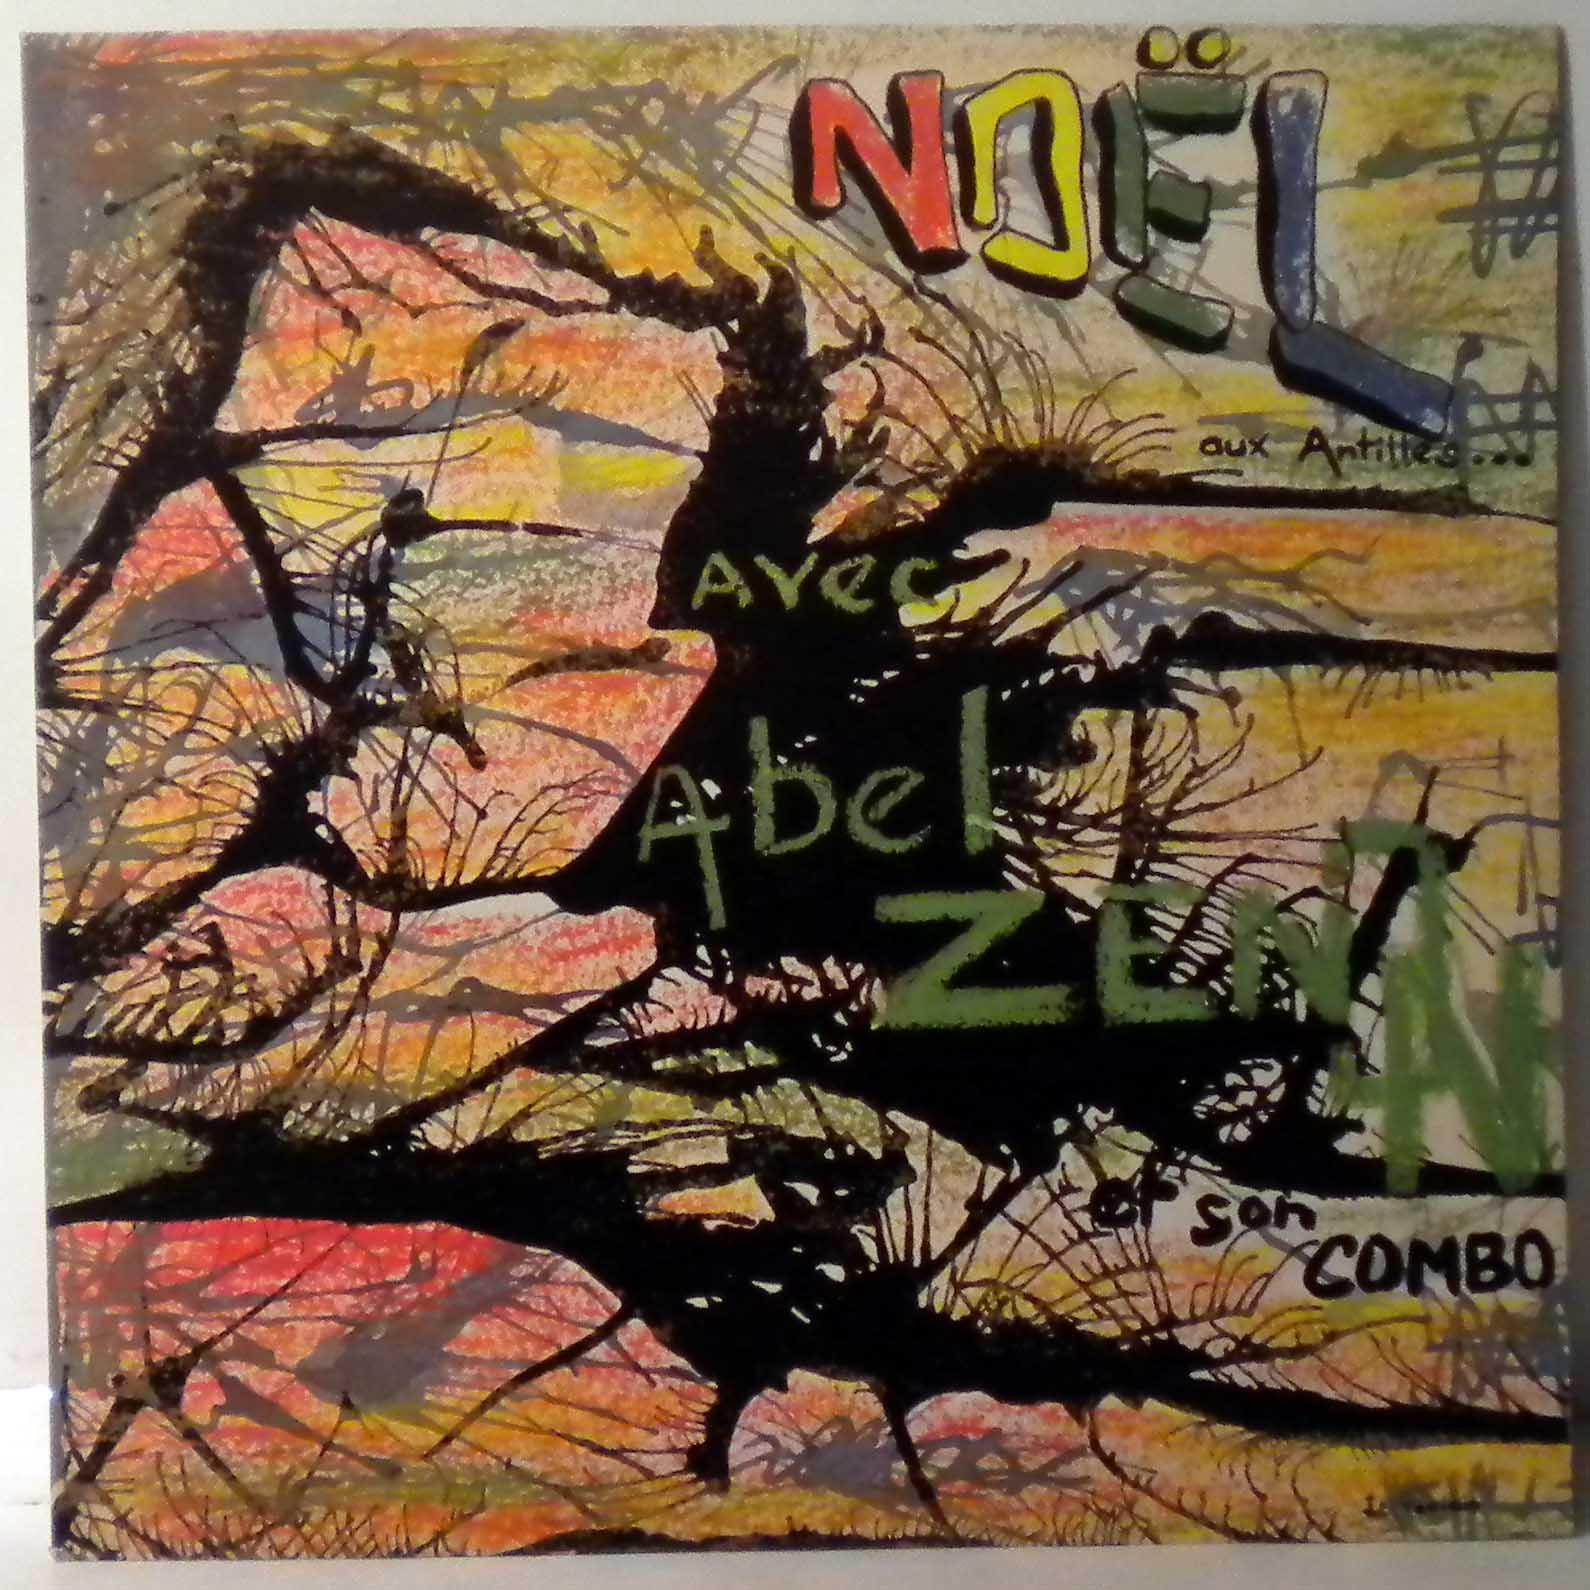 ABEL ZENON Y SU COMBO - Special Noel aux Antilles - LP